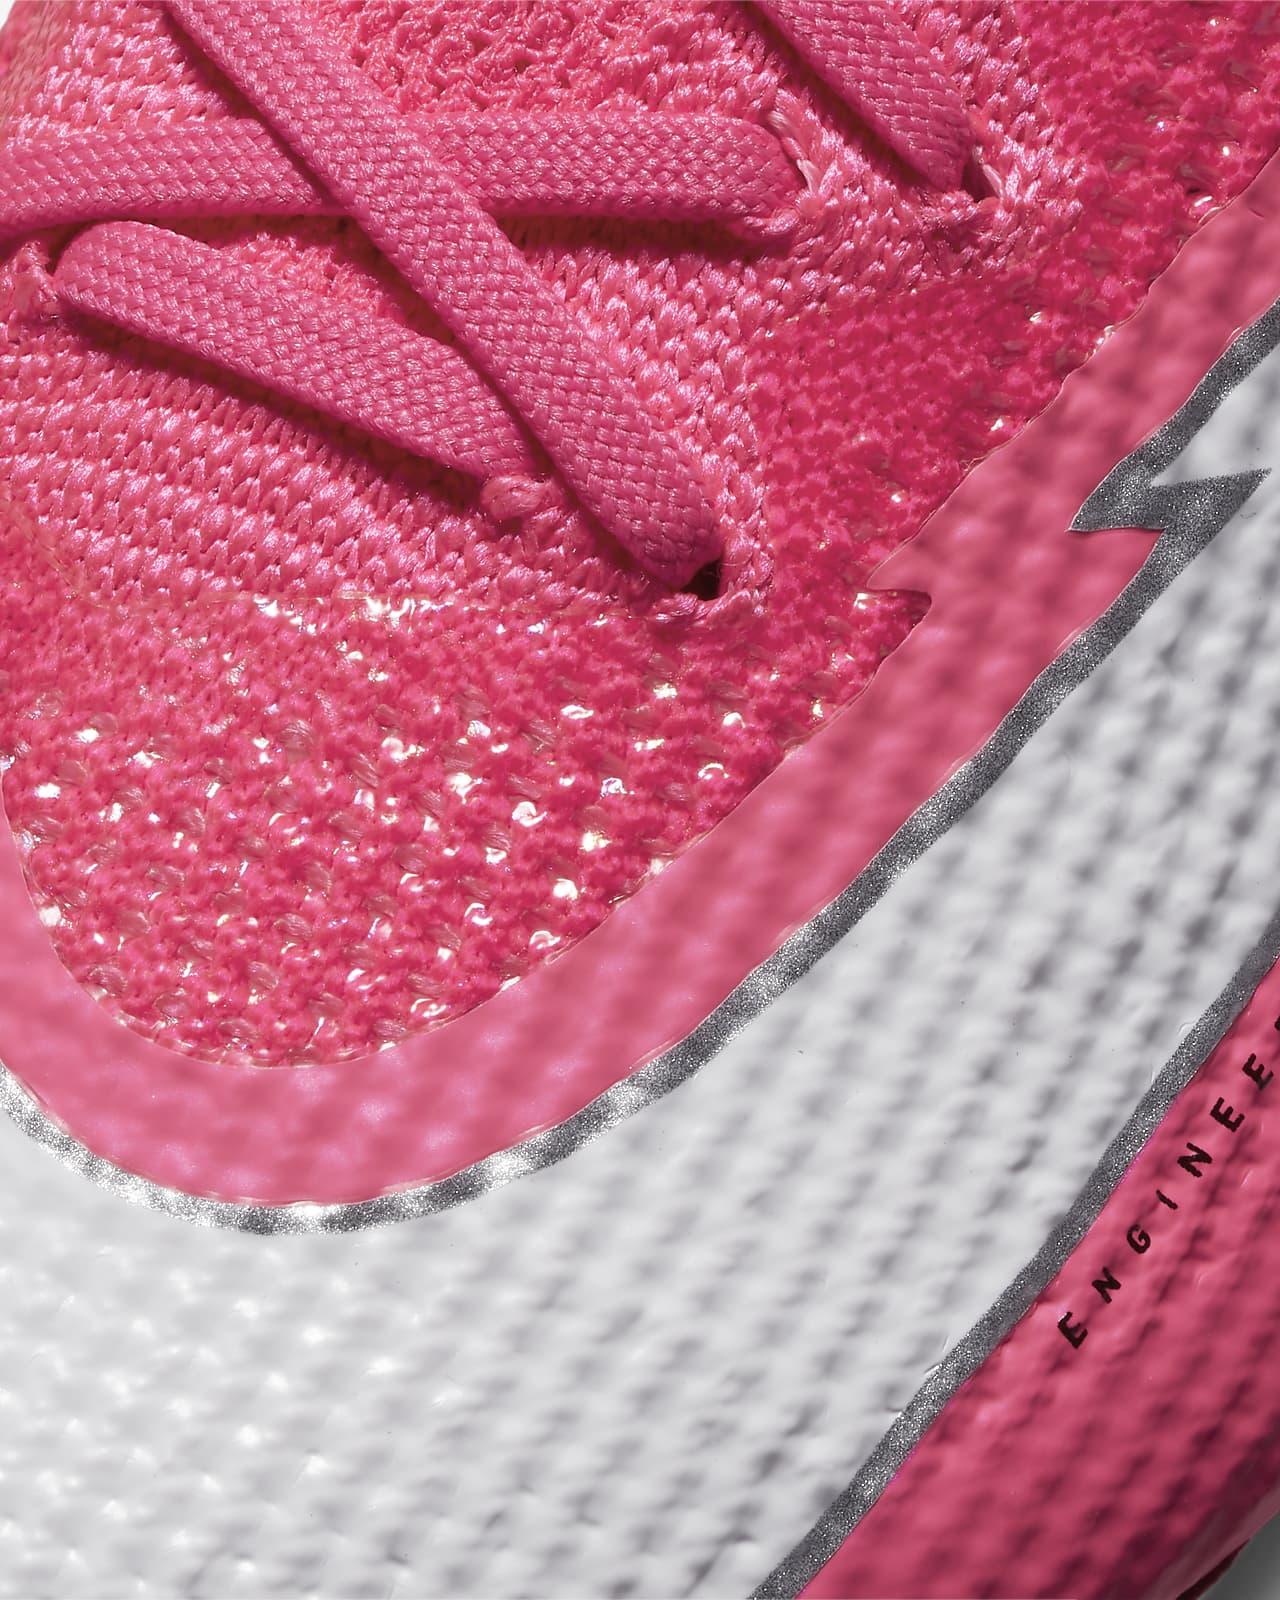 Nike Mercurial Vapor 13 Elite Mbappé Rosa FG Fußballschuh für normalen Rasen